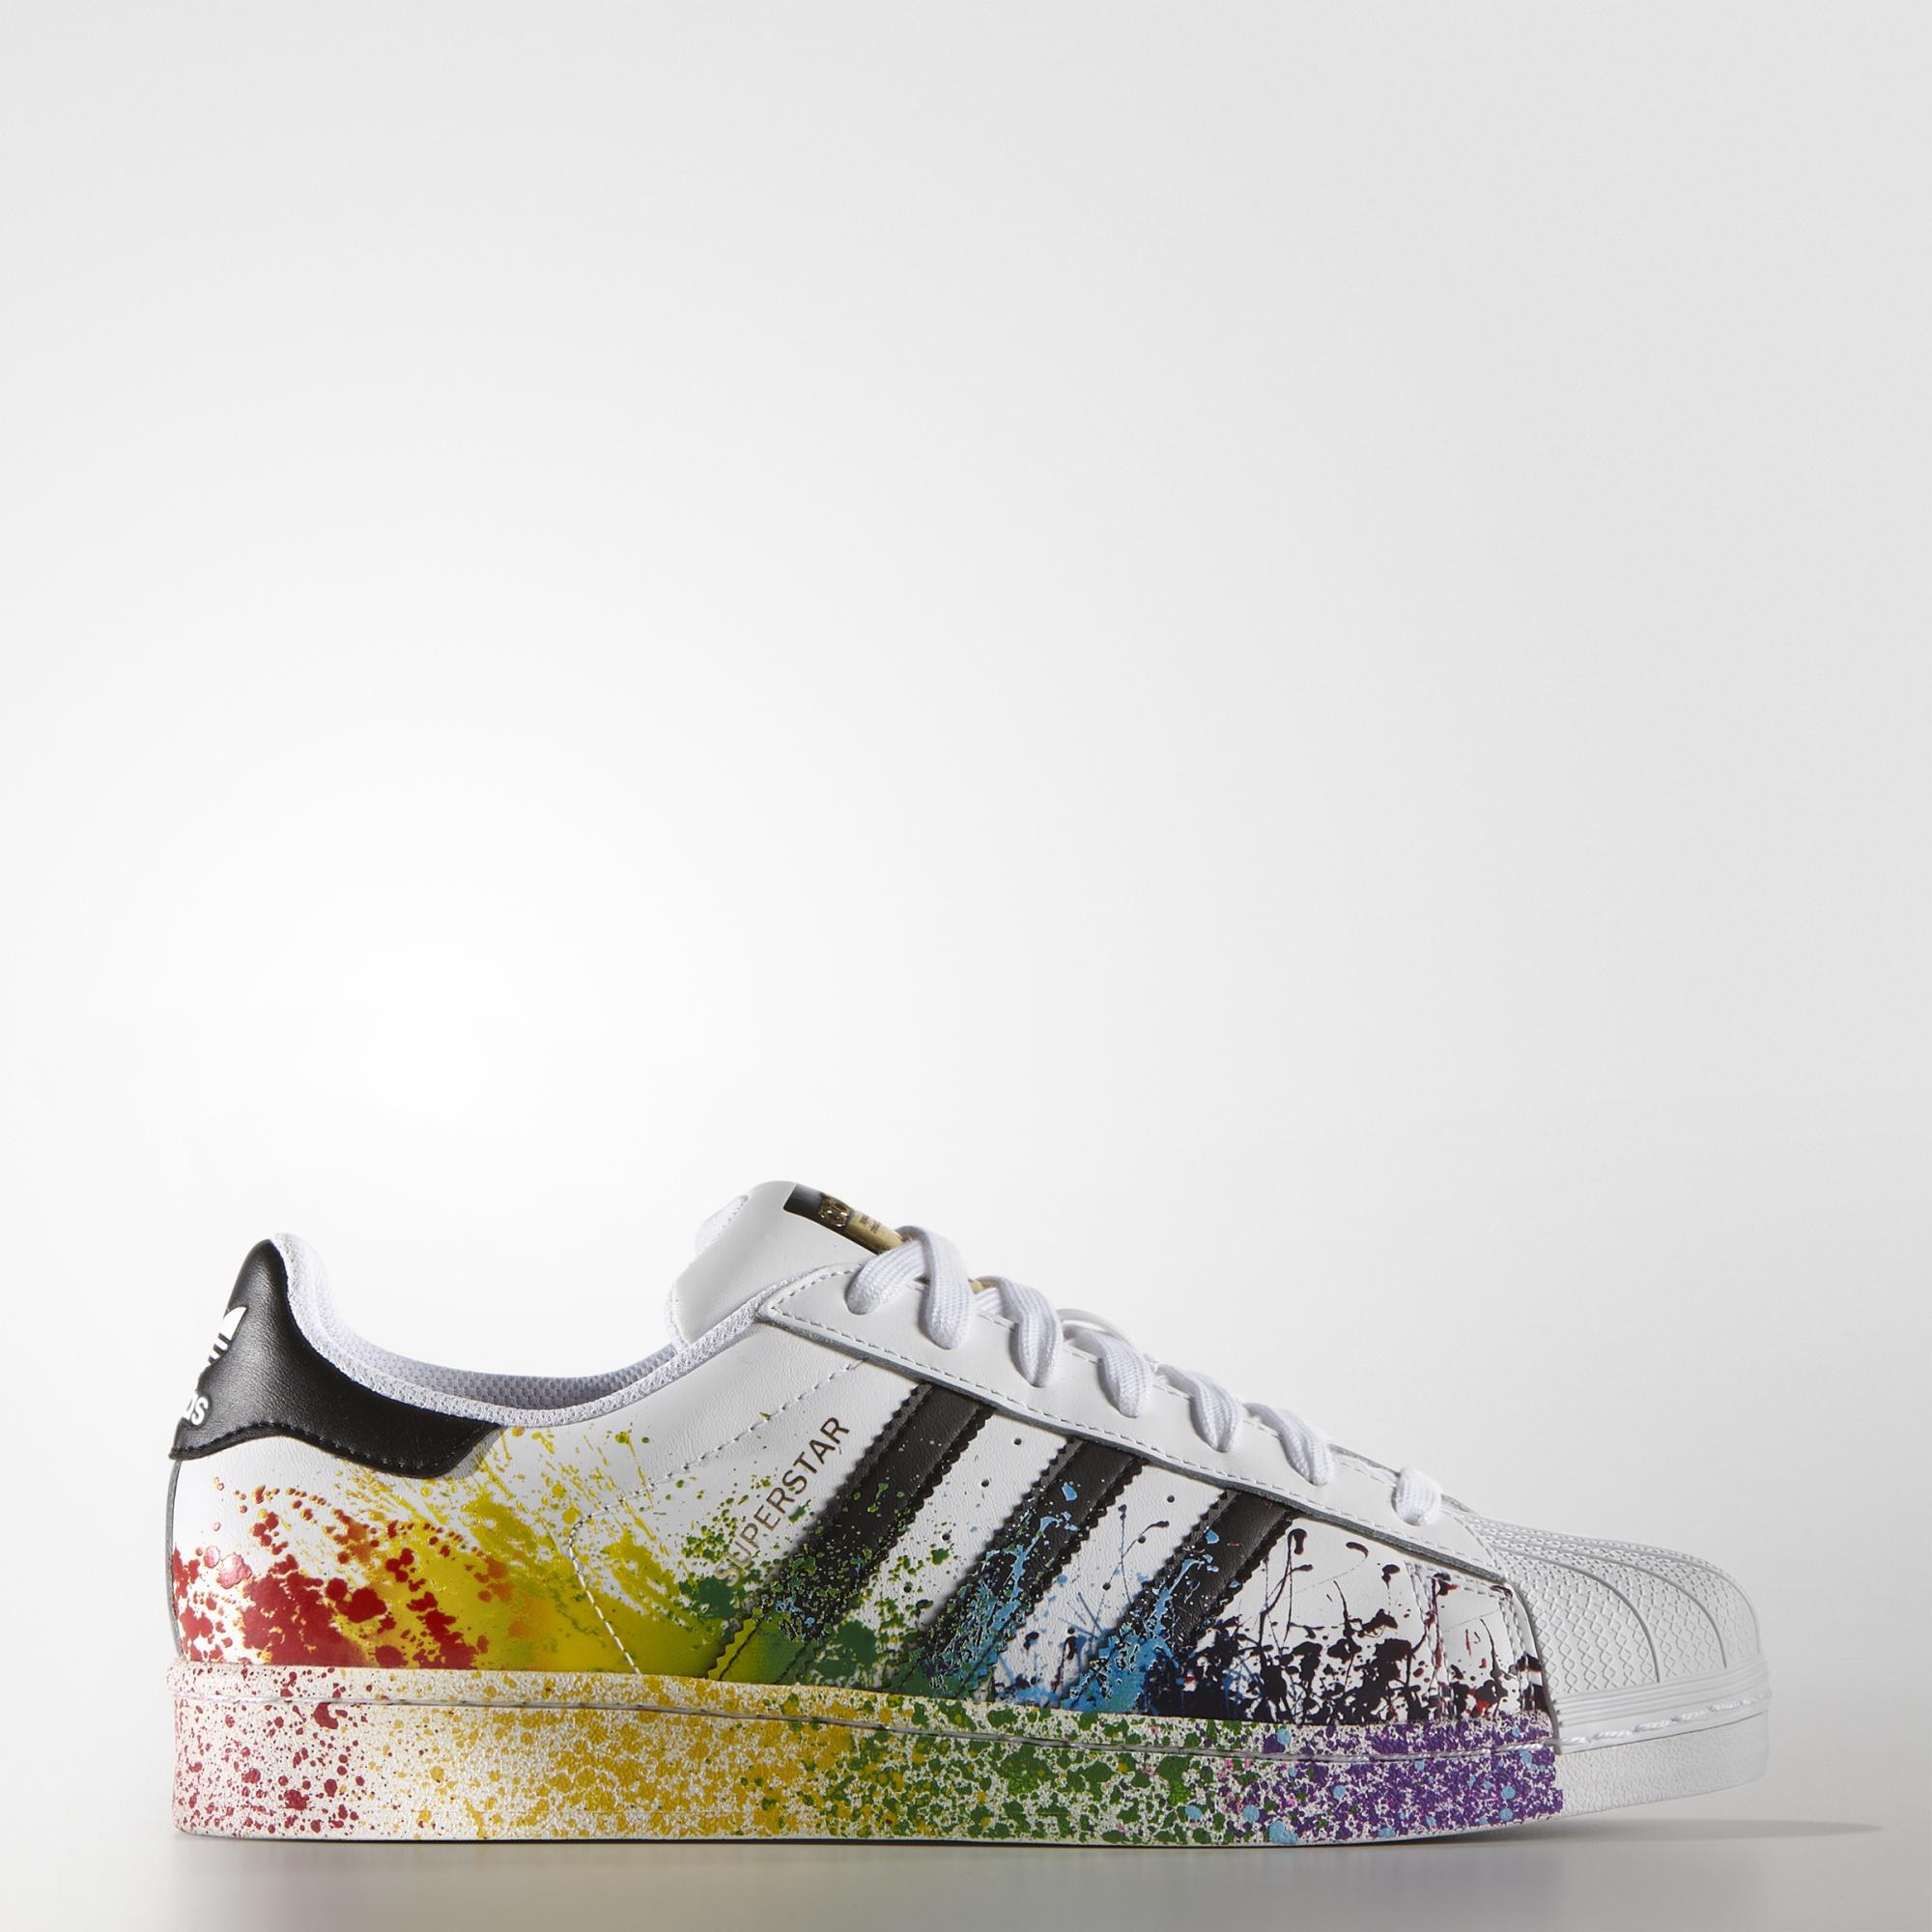 size 40 6da64 8e565 ... australia shoes rainbow adidas adidas superstars black and white white  black trainers addias sneakers sneakers gay